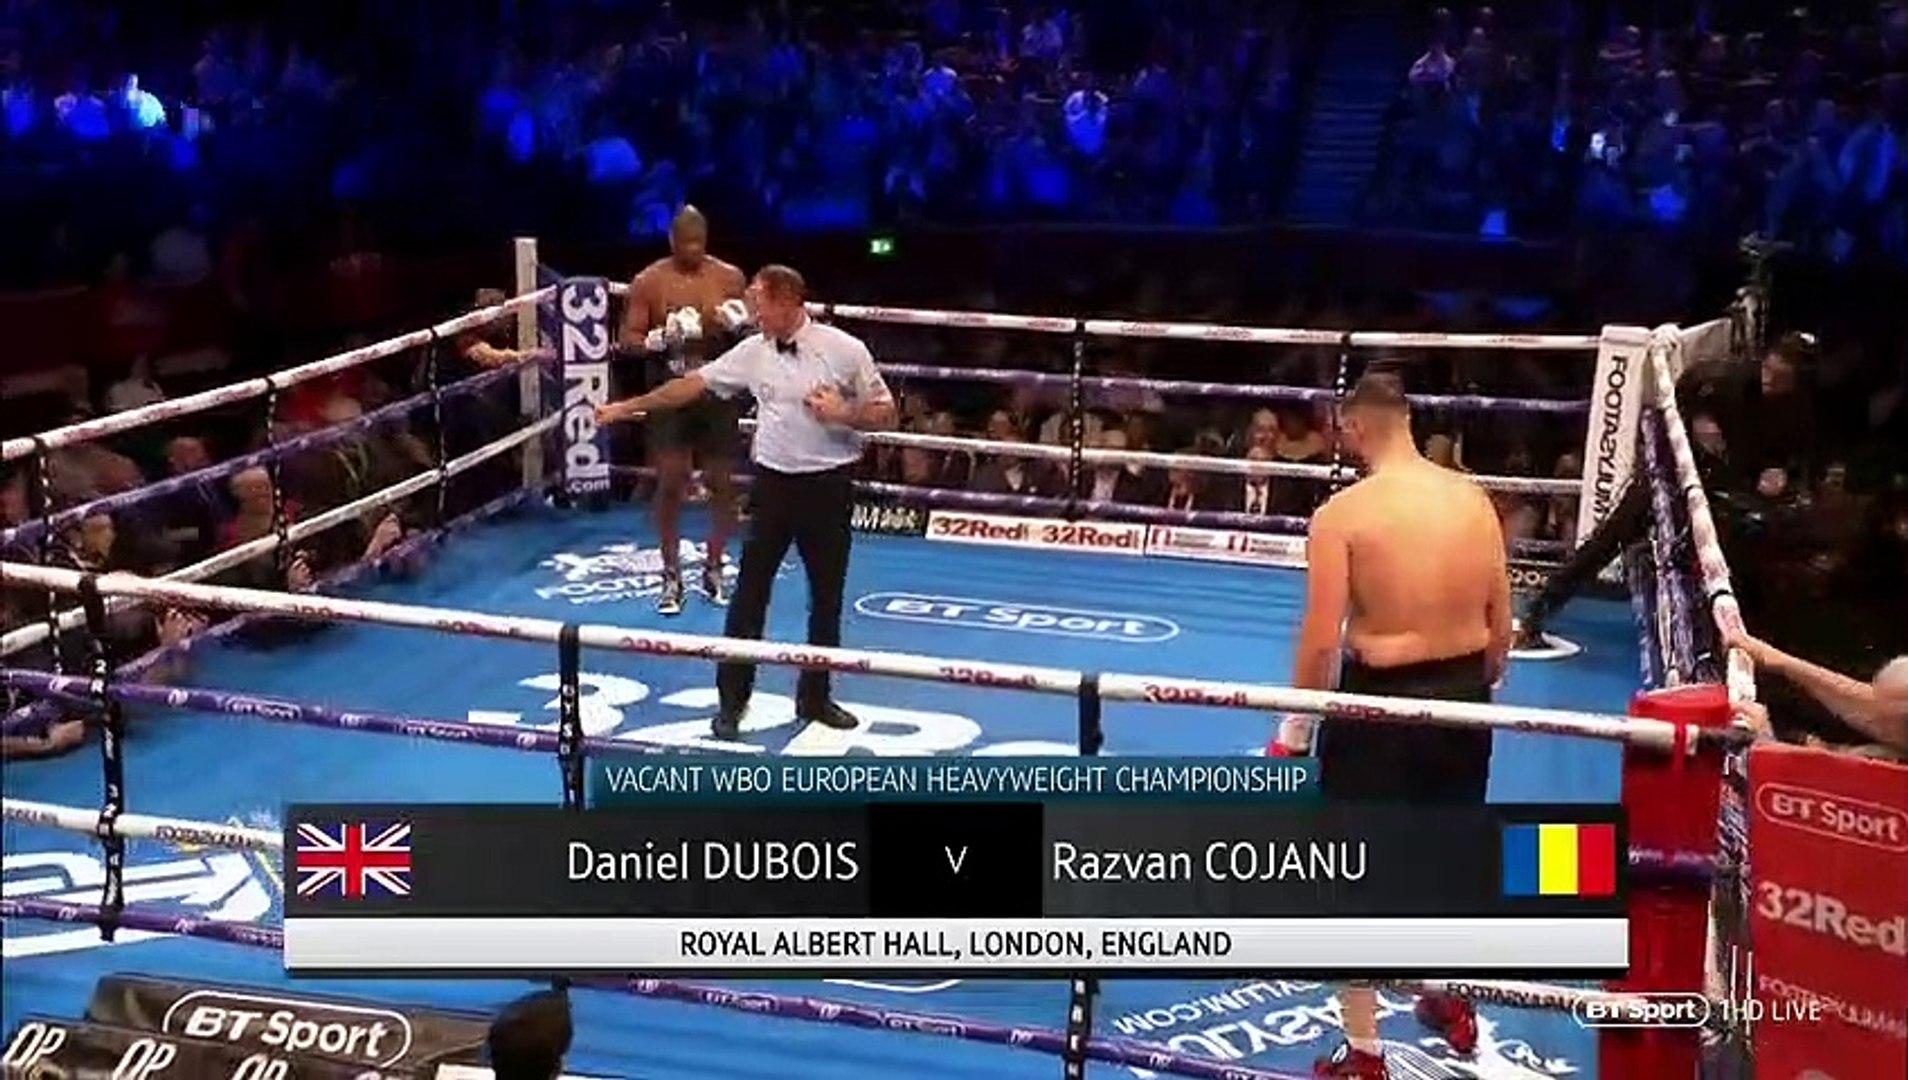 Daniel Dubois vs Razvan Cojanu (08-03-2019)